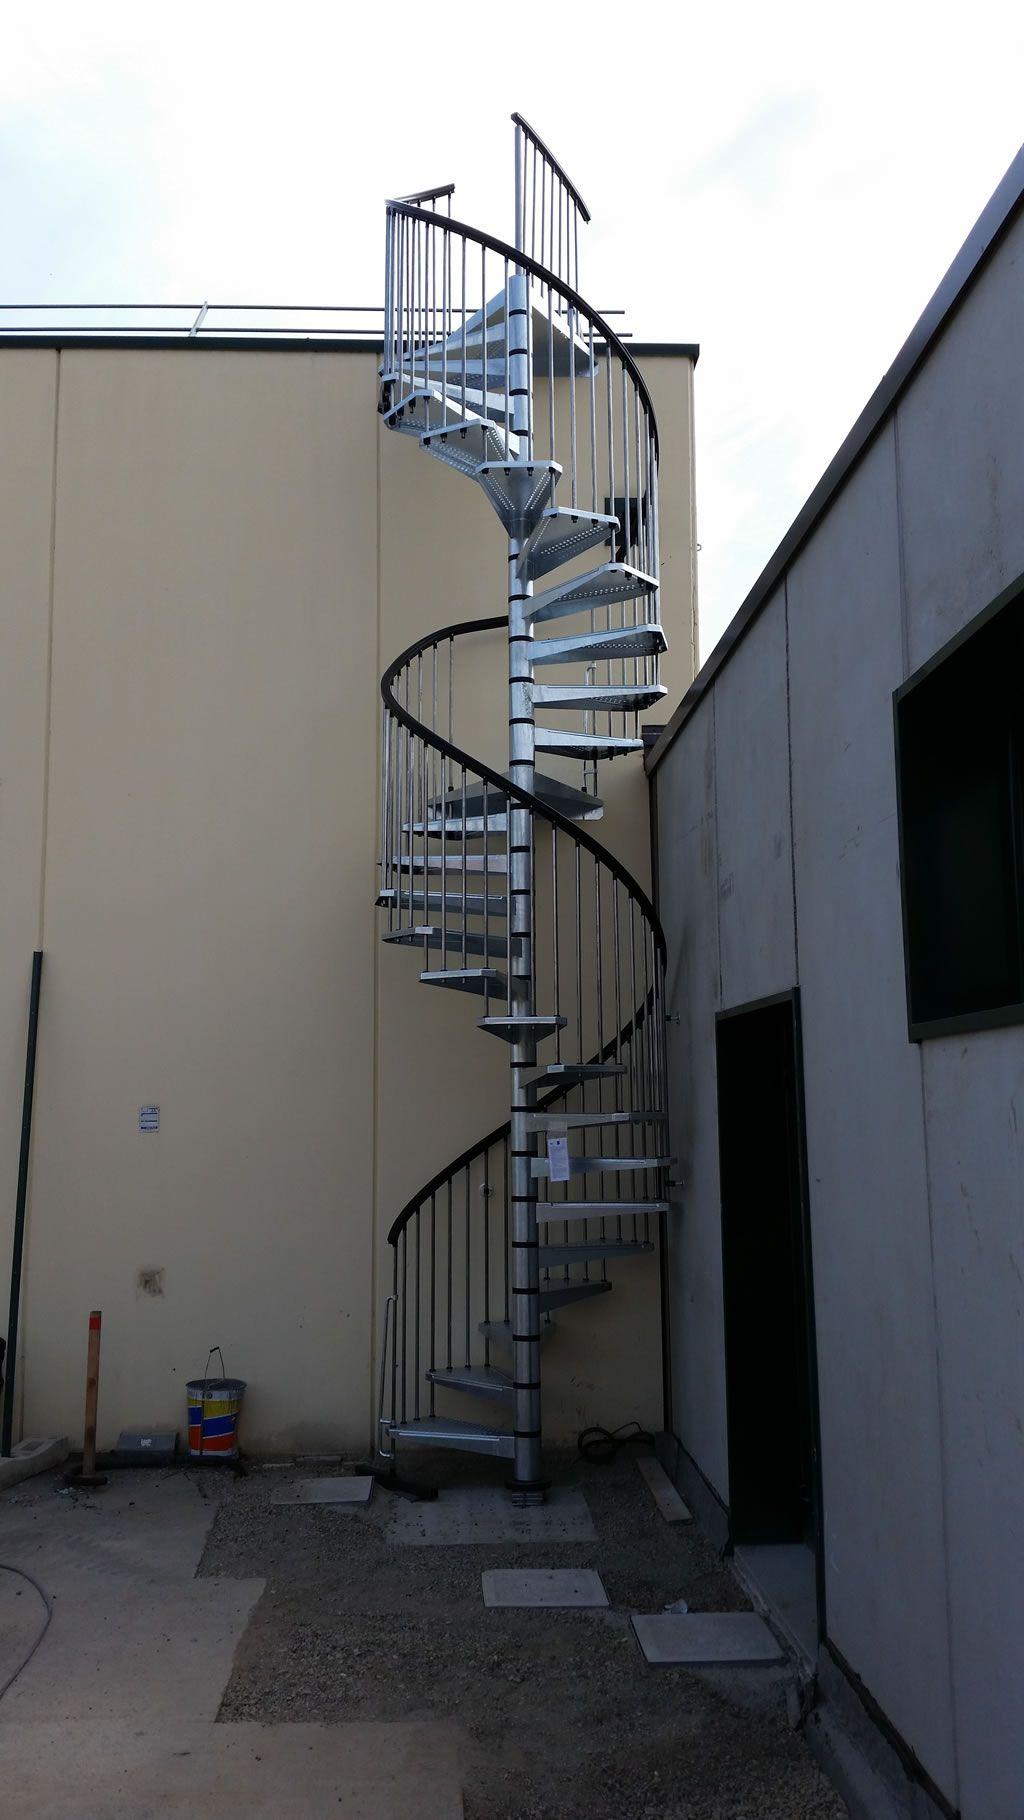 Best Fontanot Outdoor Spiral Staircase The Klio Zink Outdoor 400 x 300